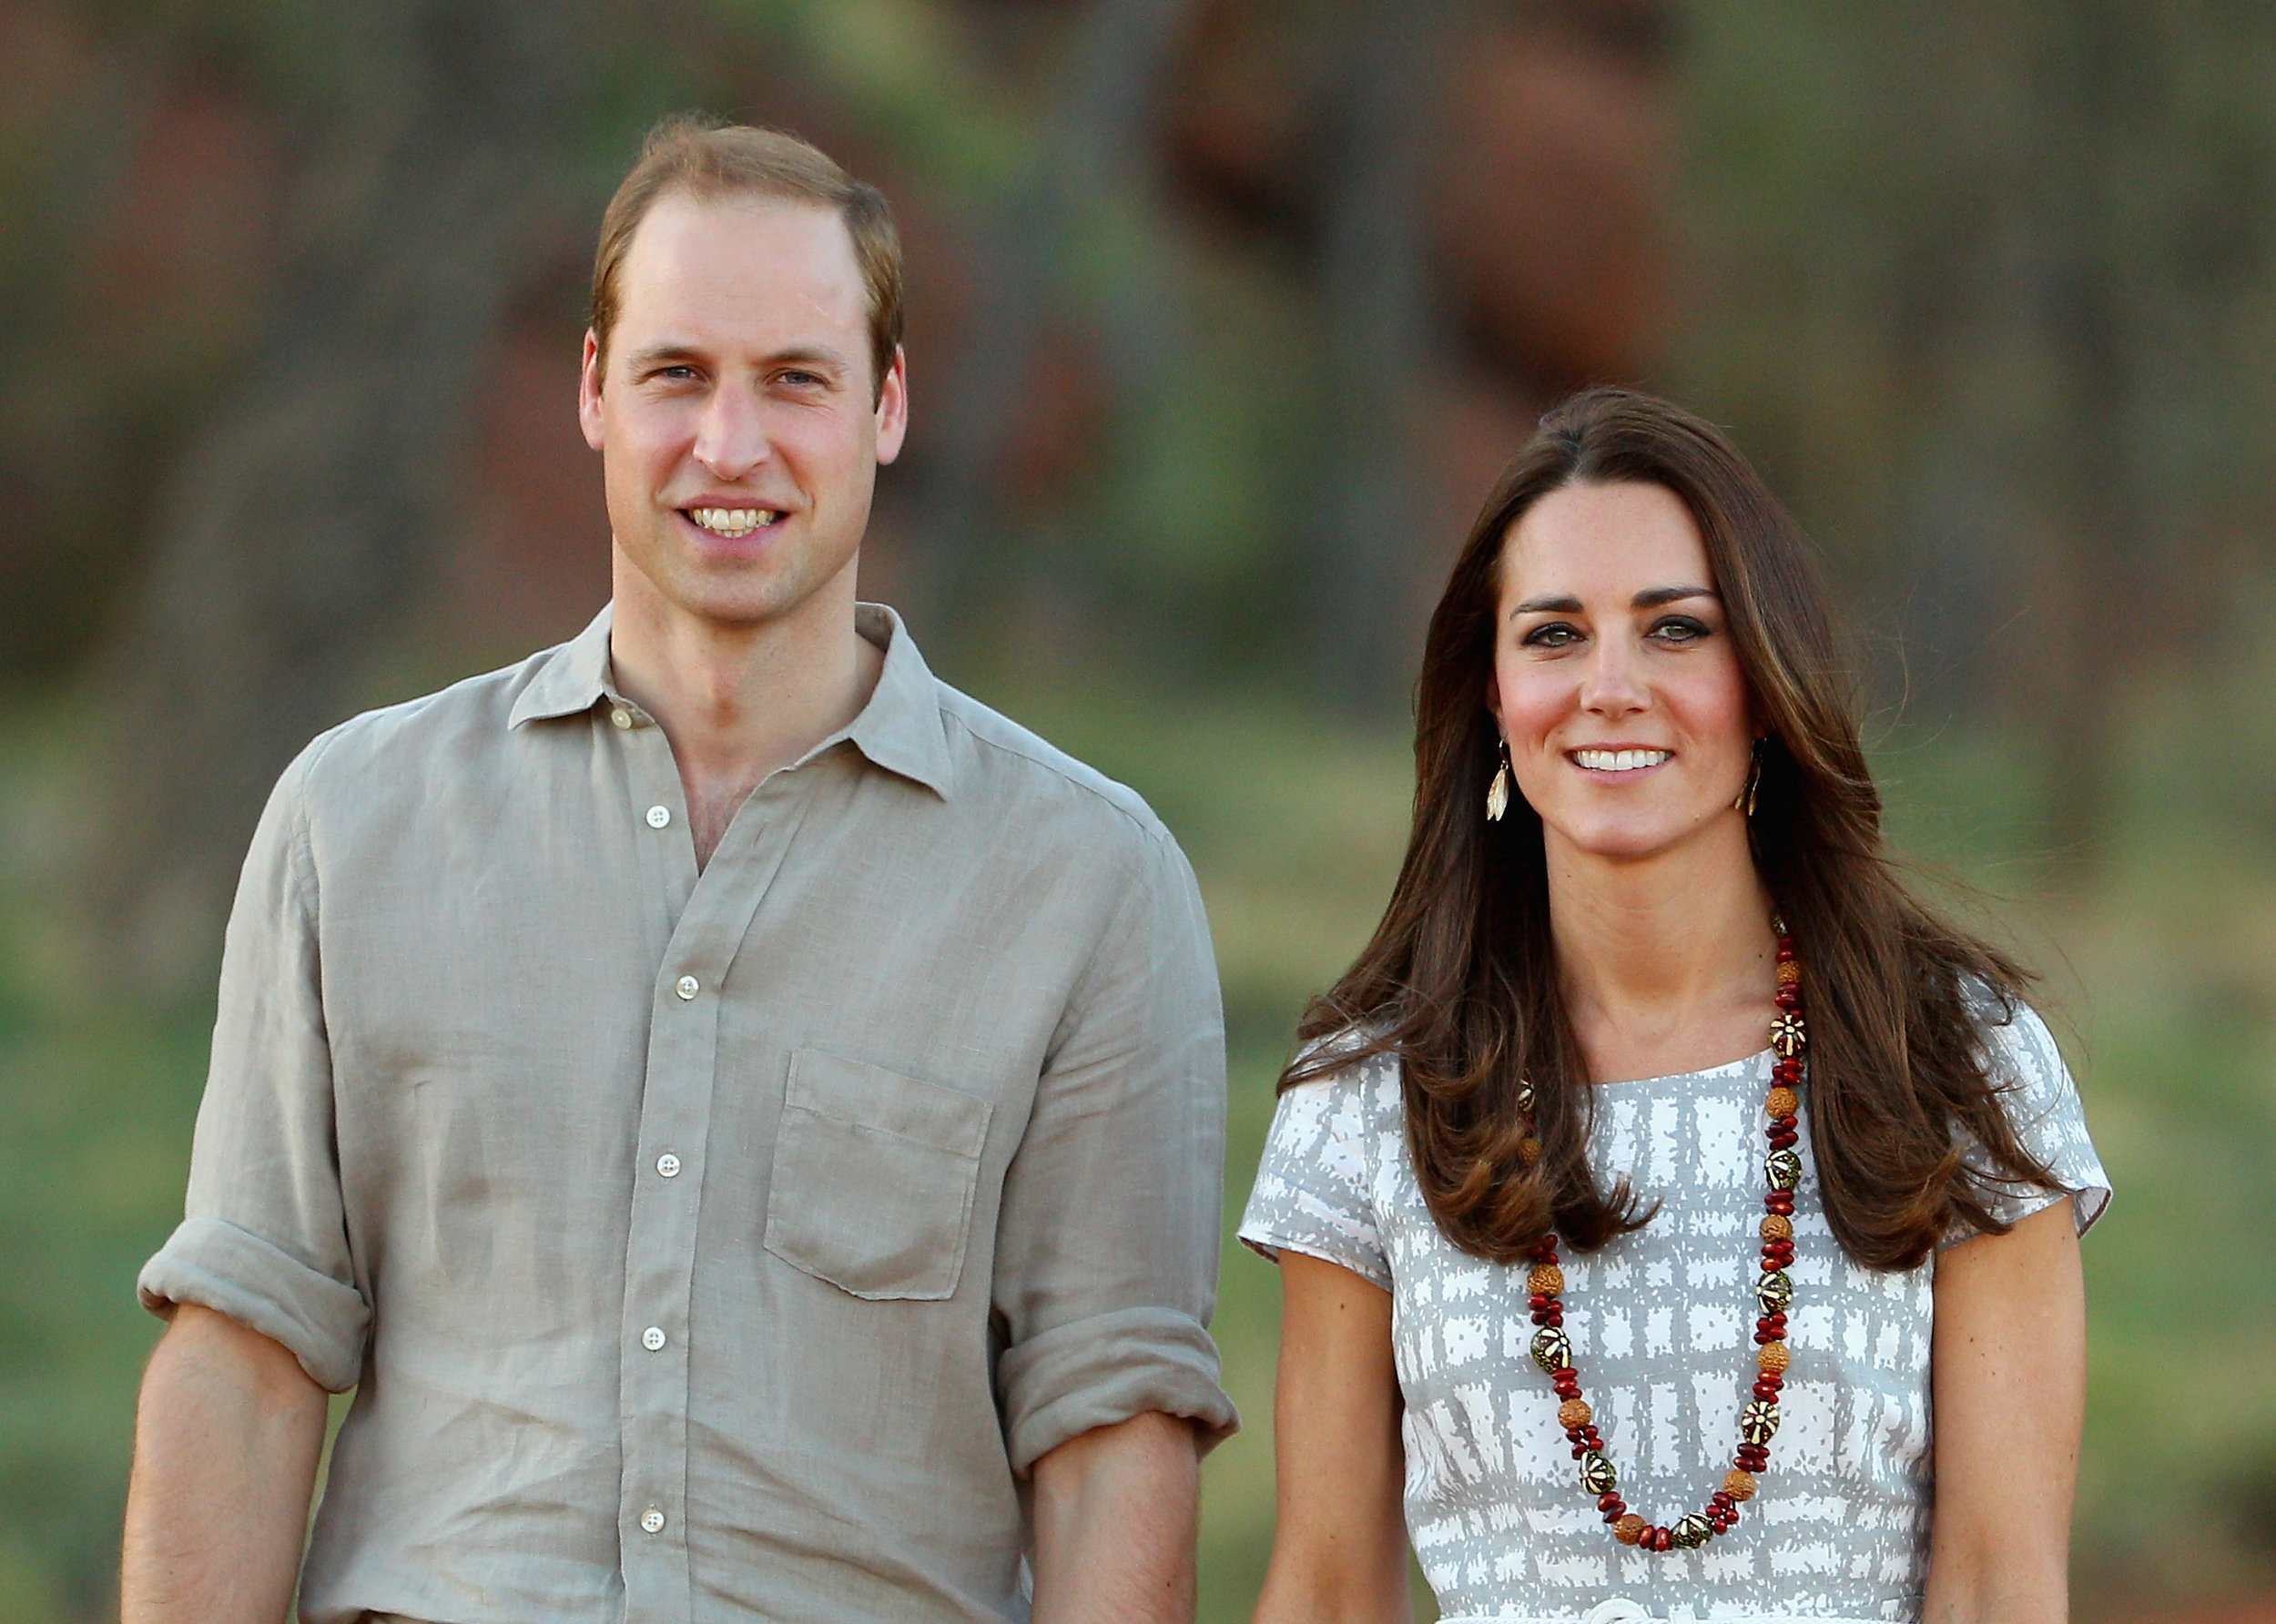 The Duke & Duchess of Cambridge Kensington Palace London W8 4PU England   Foto: Getty Images